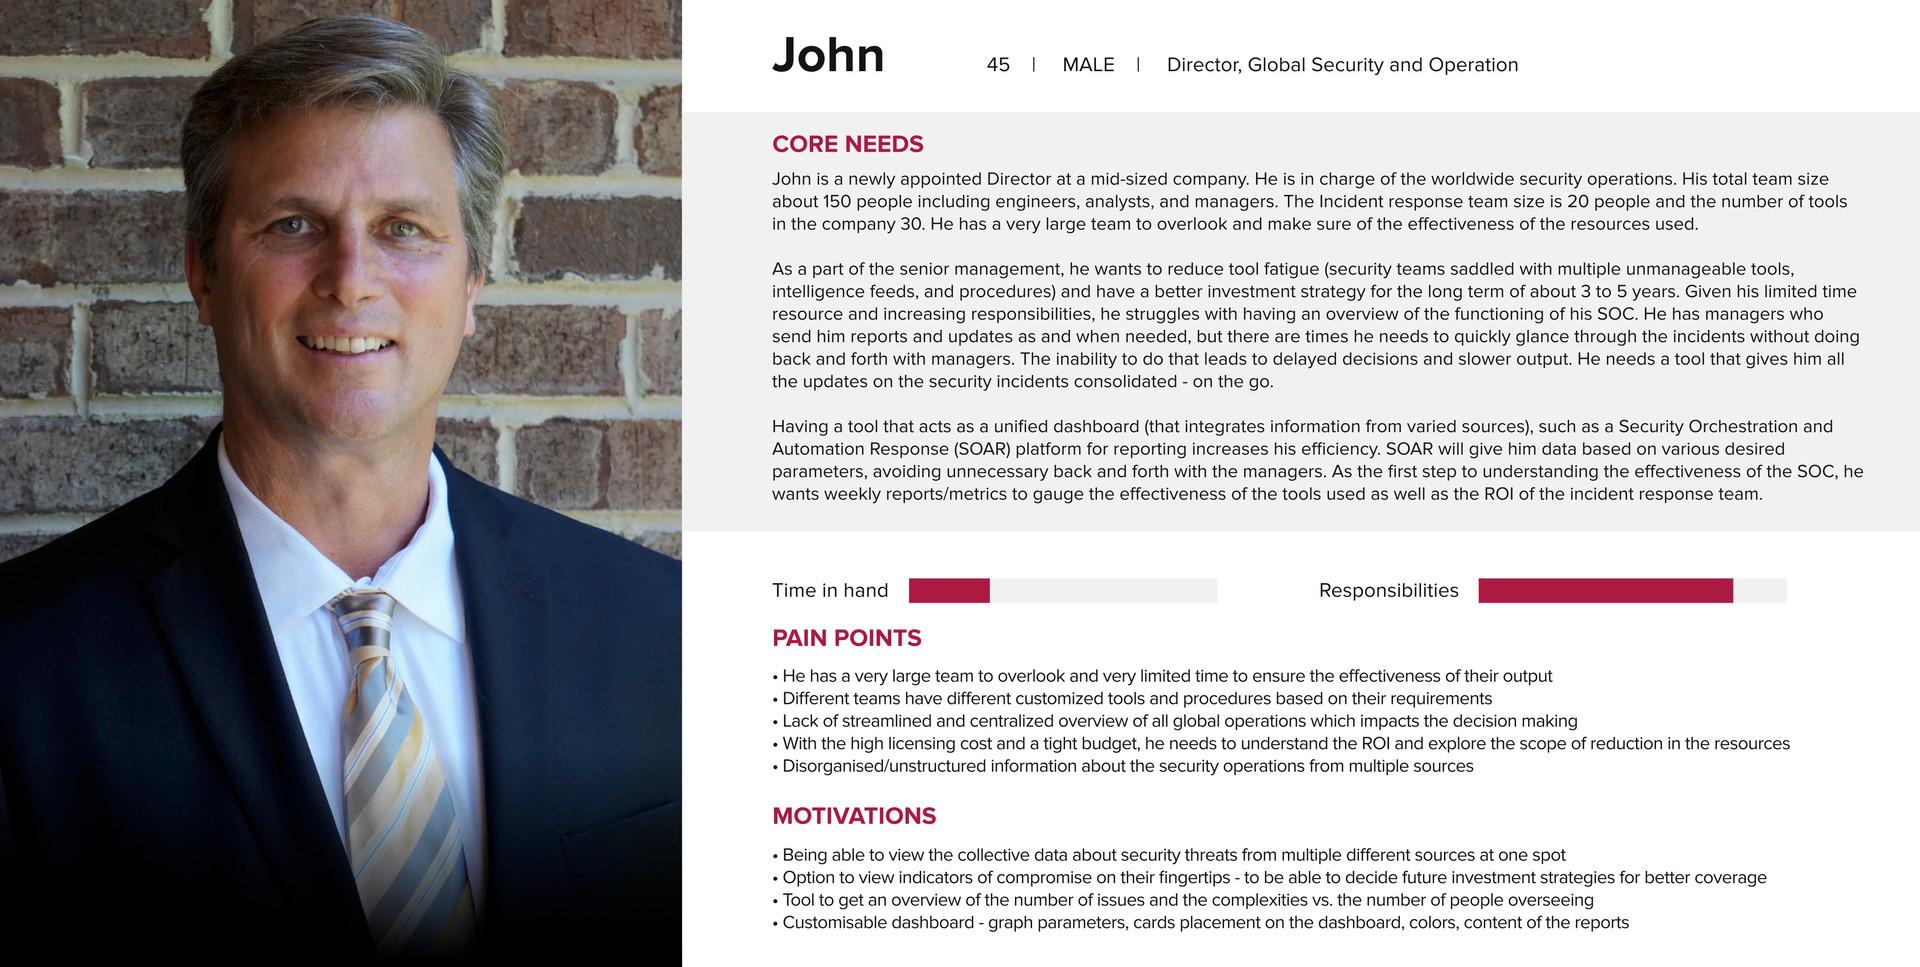 John's Persona.jpg